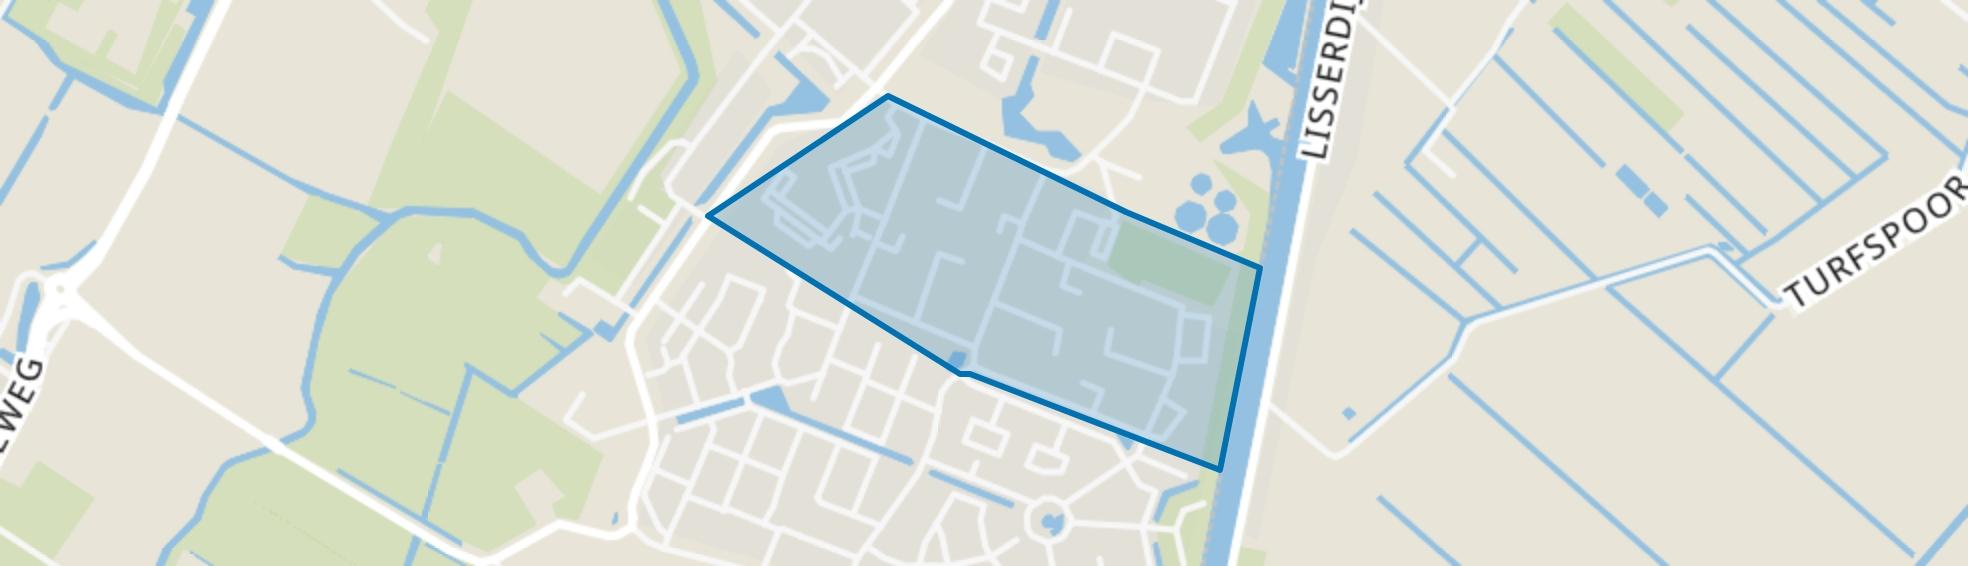 Schildersbuurt, Lisse map